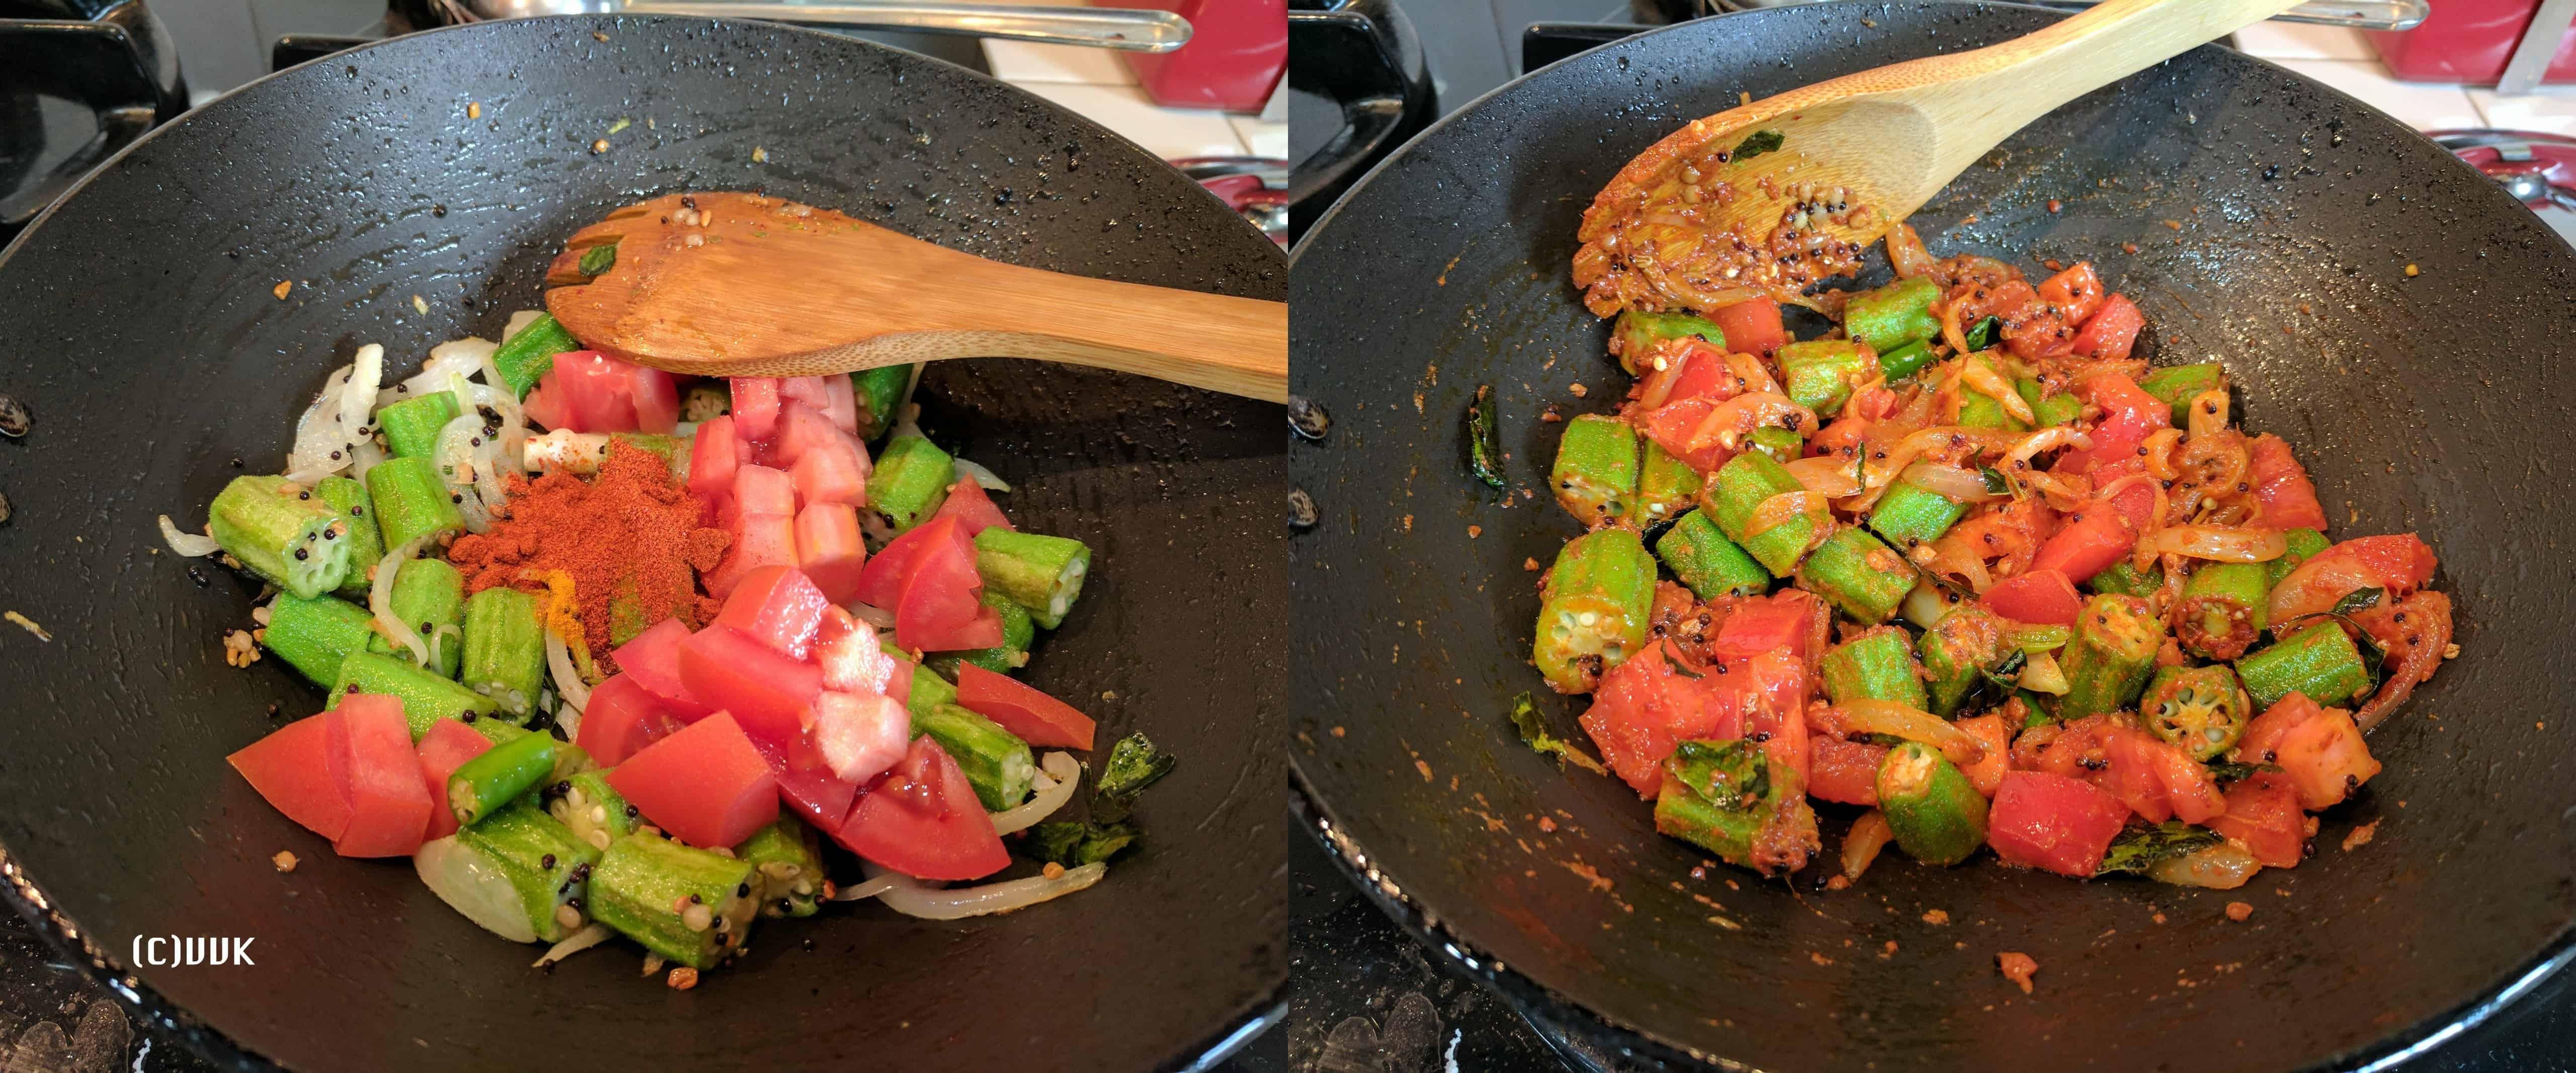 Adding the chopped tomato, salt, and red chili powder